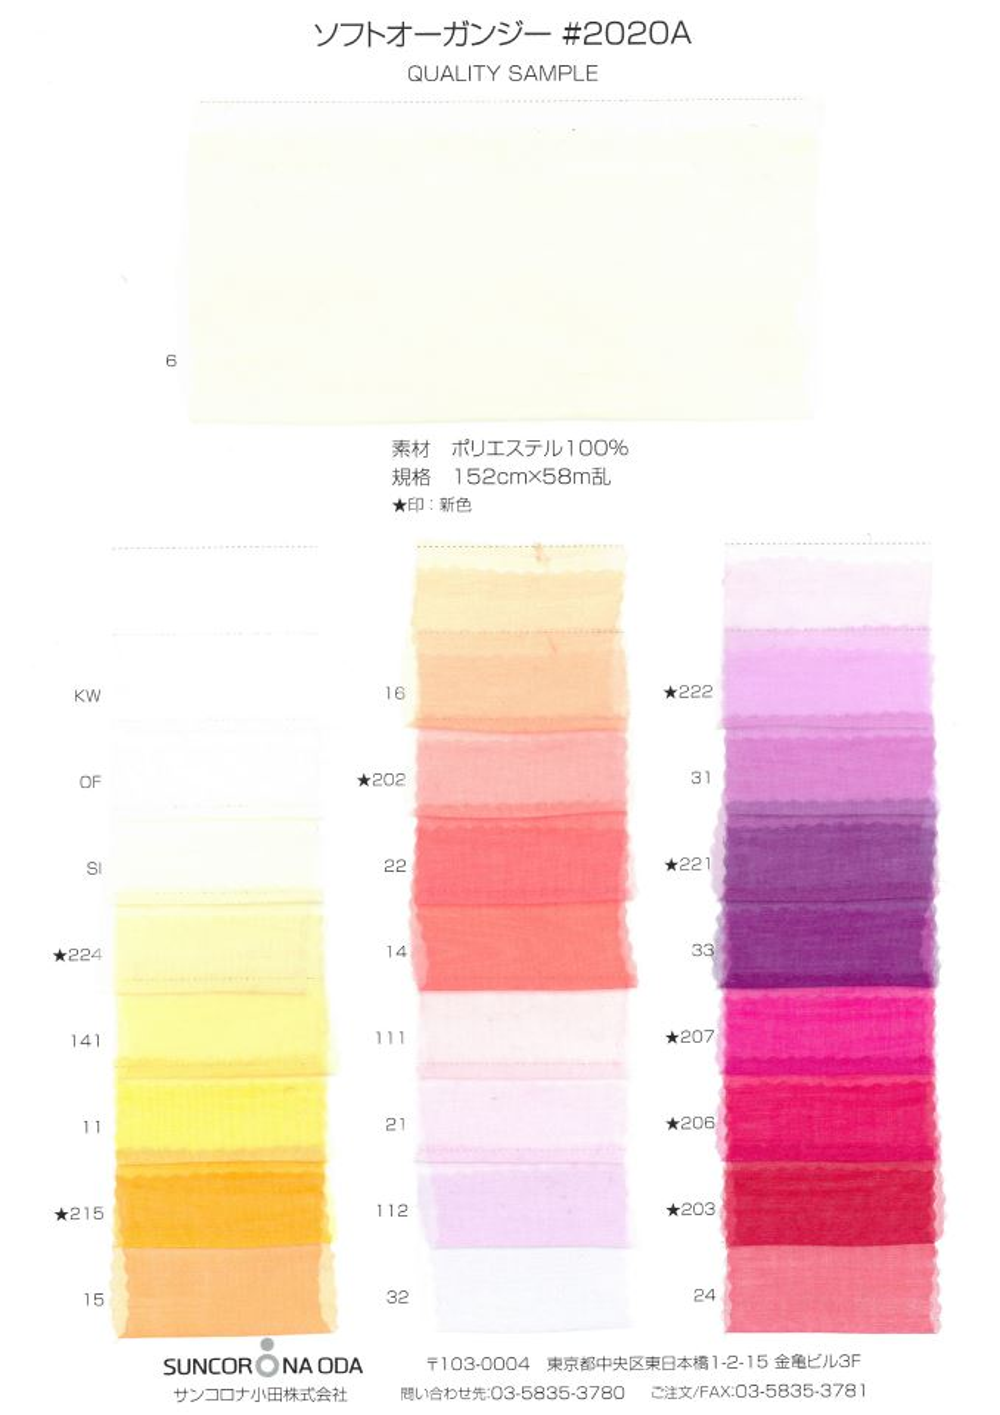 2020A ポリエステルソフトオーガンジー[生地] サンコロナ小田/オークラ商事 - ApparelX アパレル資材卸通販